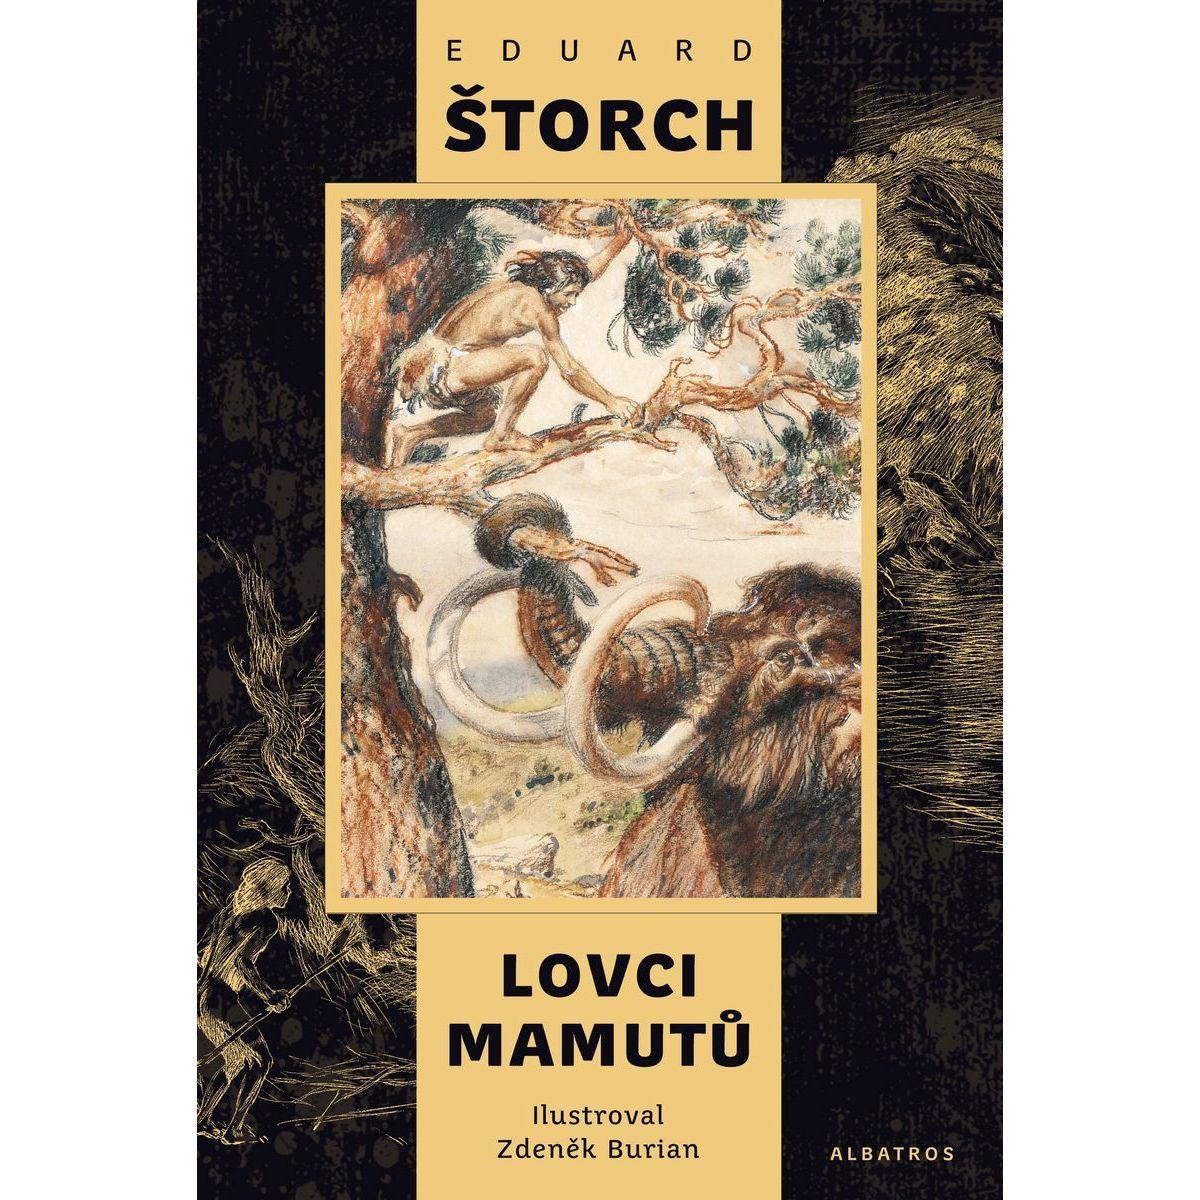 Lovci mamutov Eduard Štorch, Zdeněk Burian ilustrácie